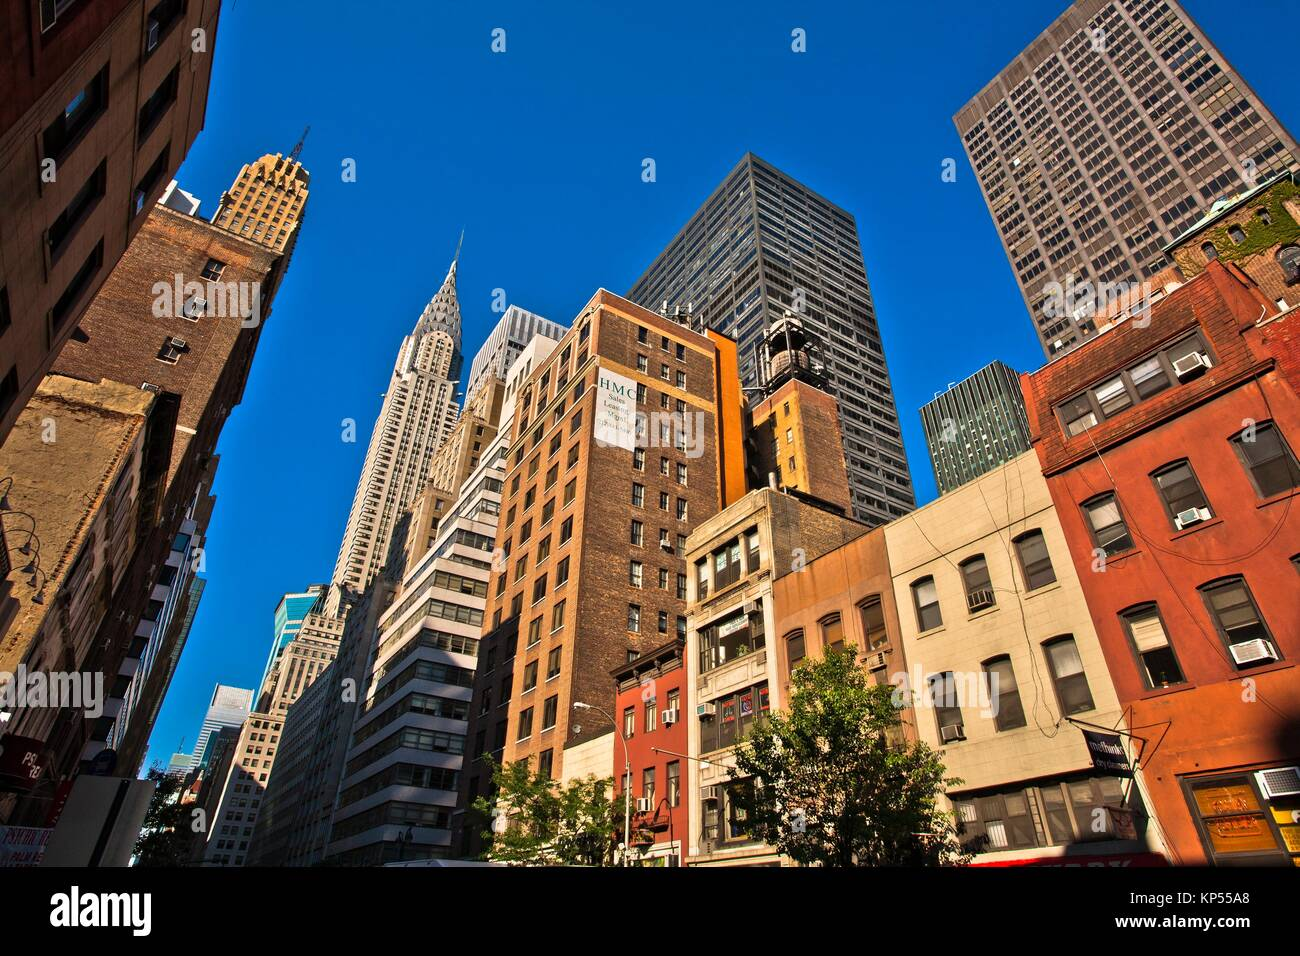 On background Chrysler Building, Midtown, Manhattan, New York City, New York, USA. - Stock Image